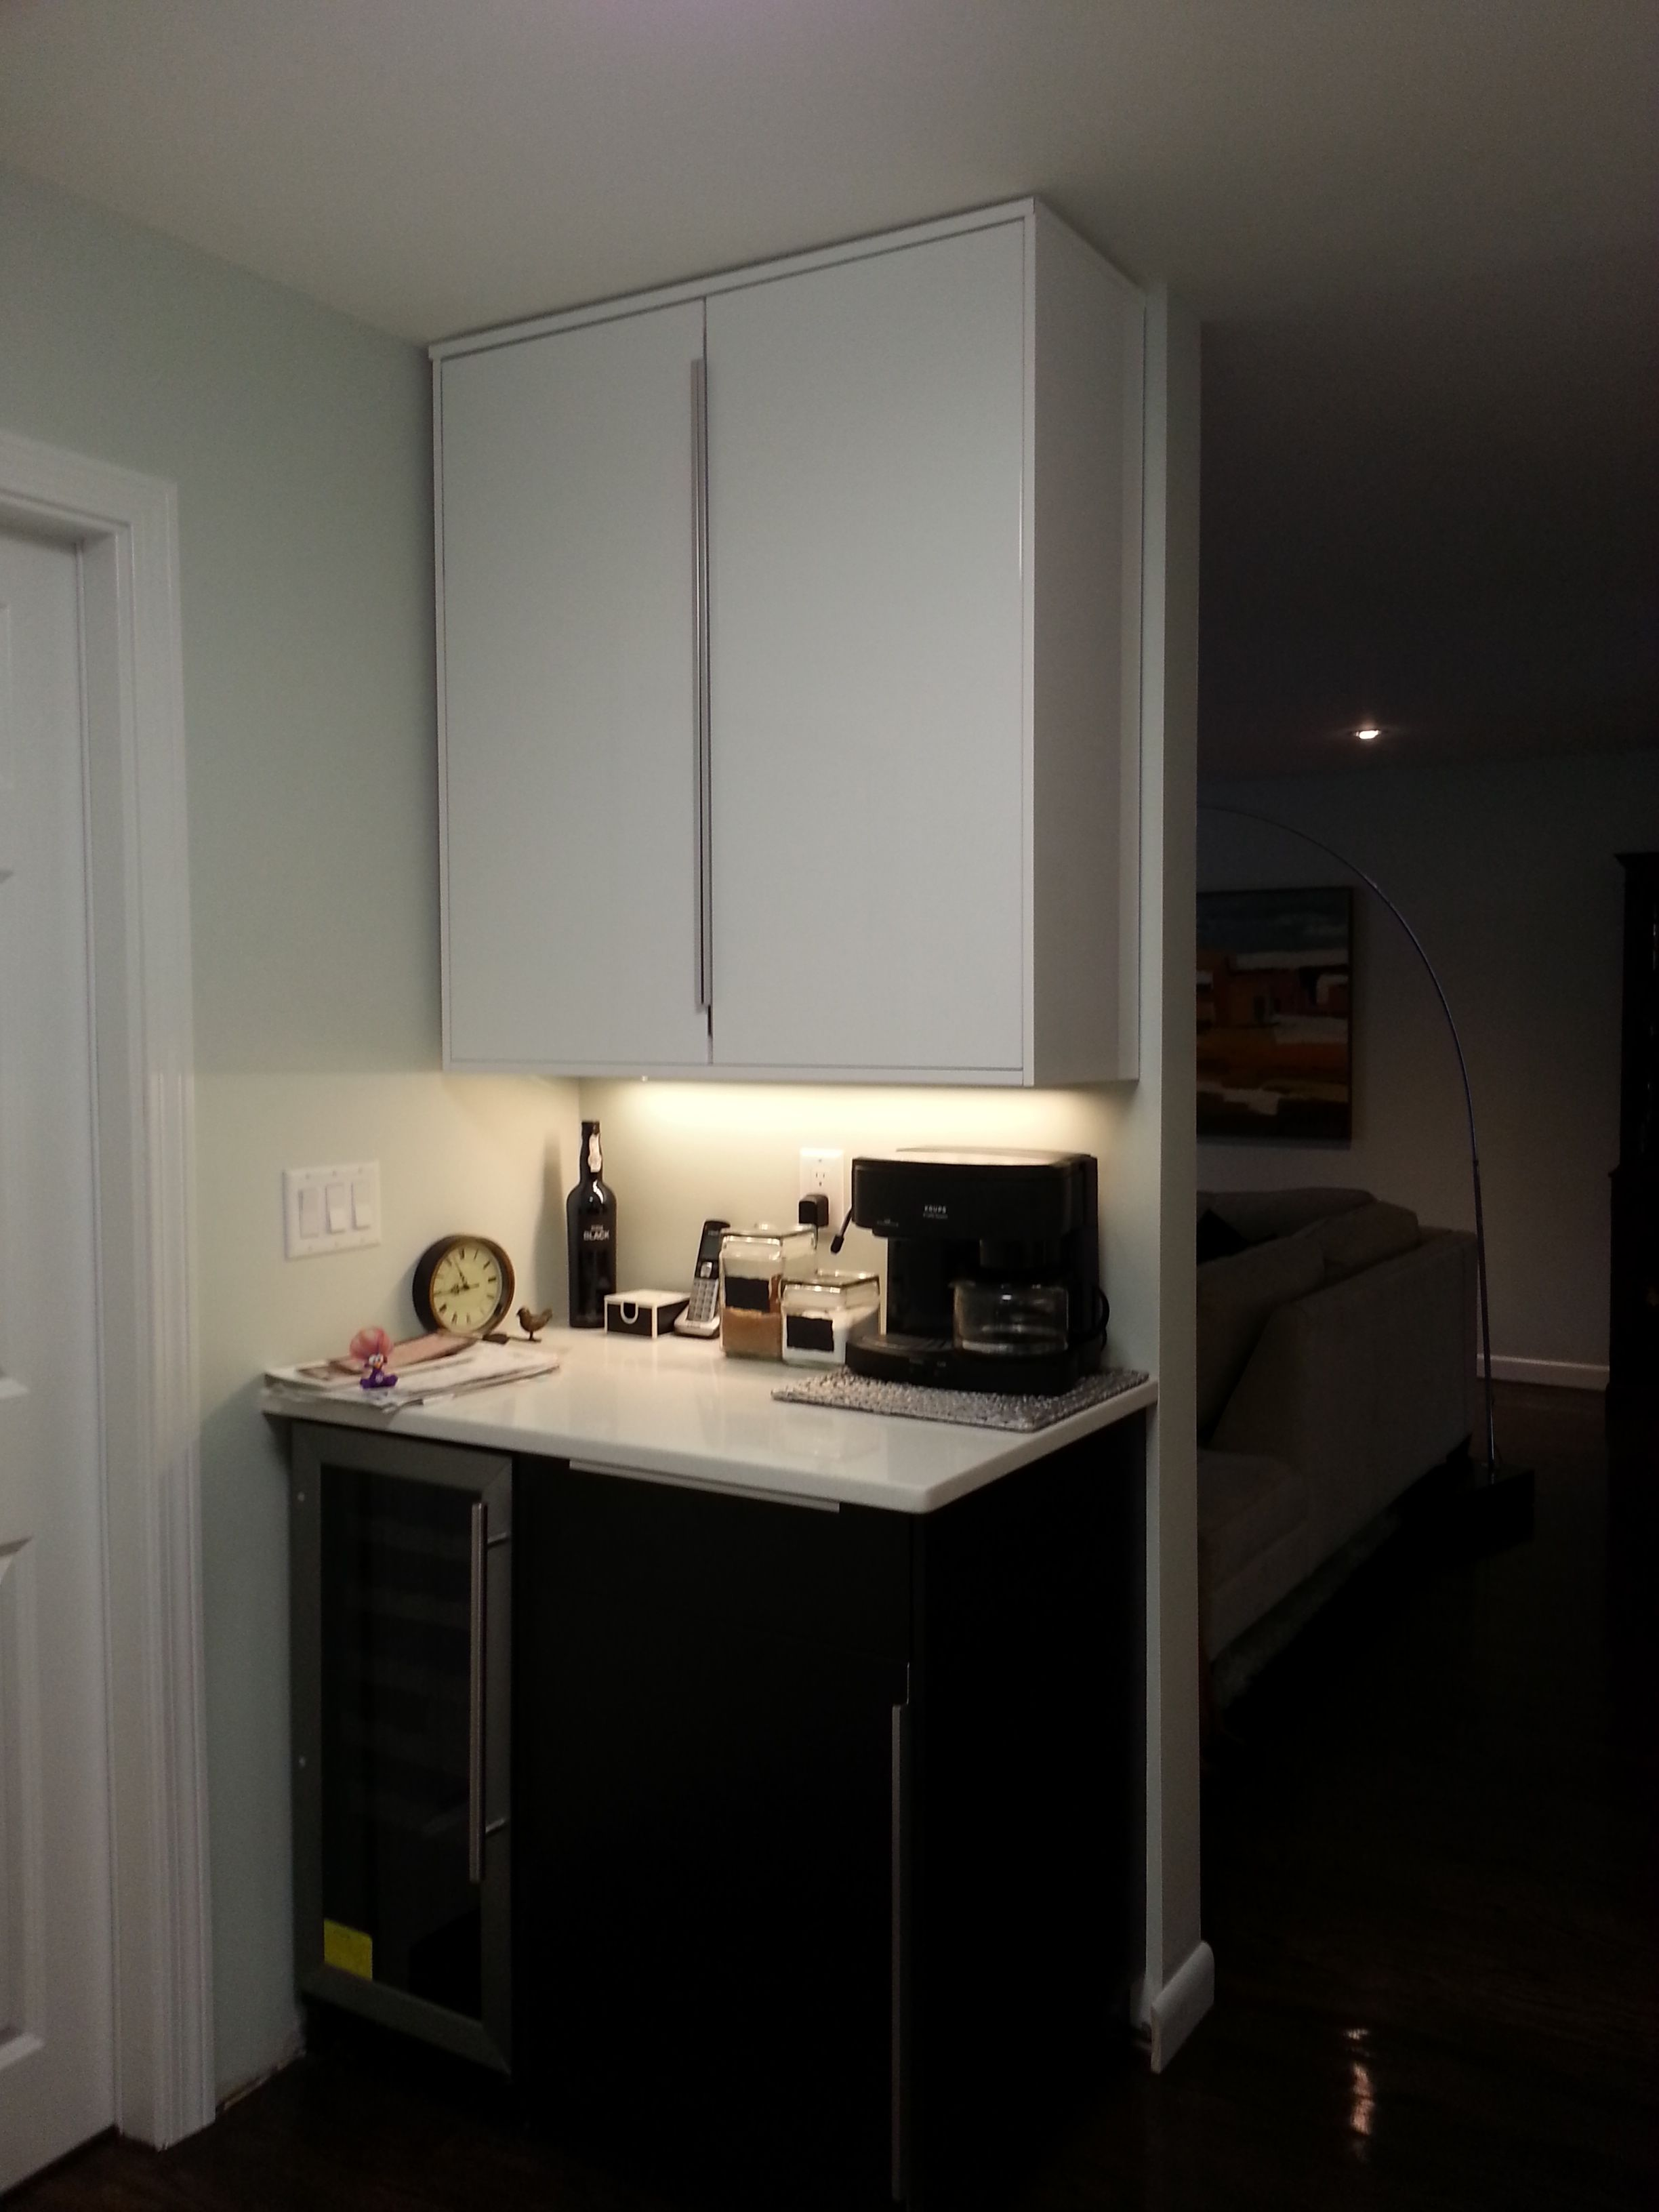 ringhult white with blankett handles my ikea kitchen designs pinterest ikea kitchen design. Black Bedroom Furniture Sets. Home Design Ideas